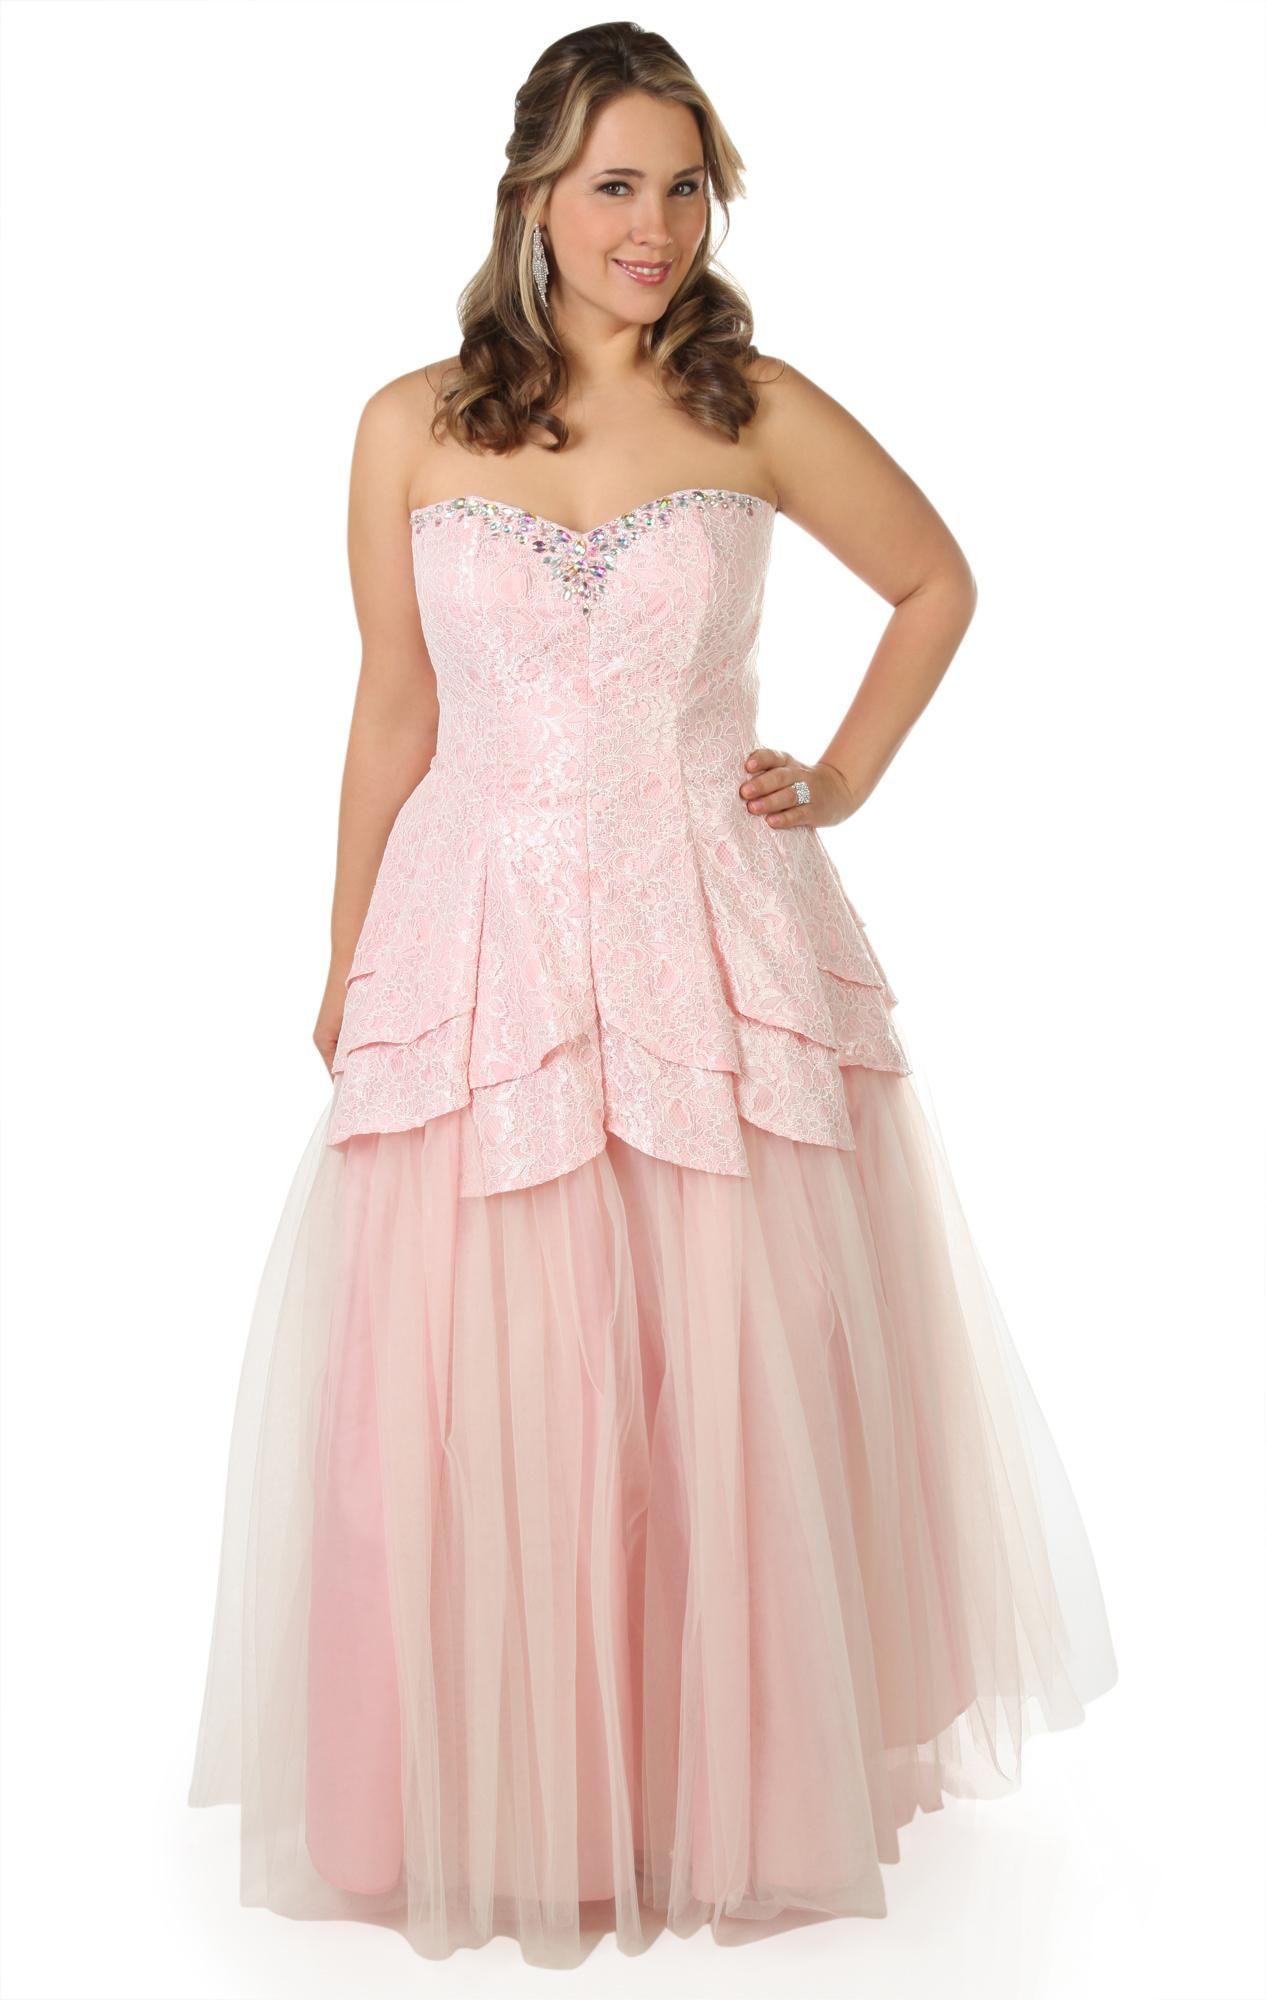 Debs Plus Size Prom Dresses - raveitsafe